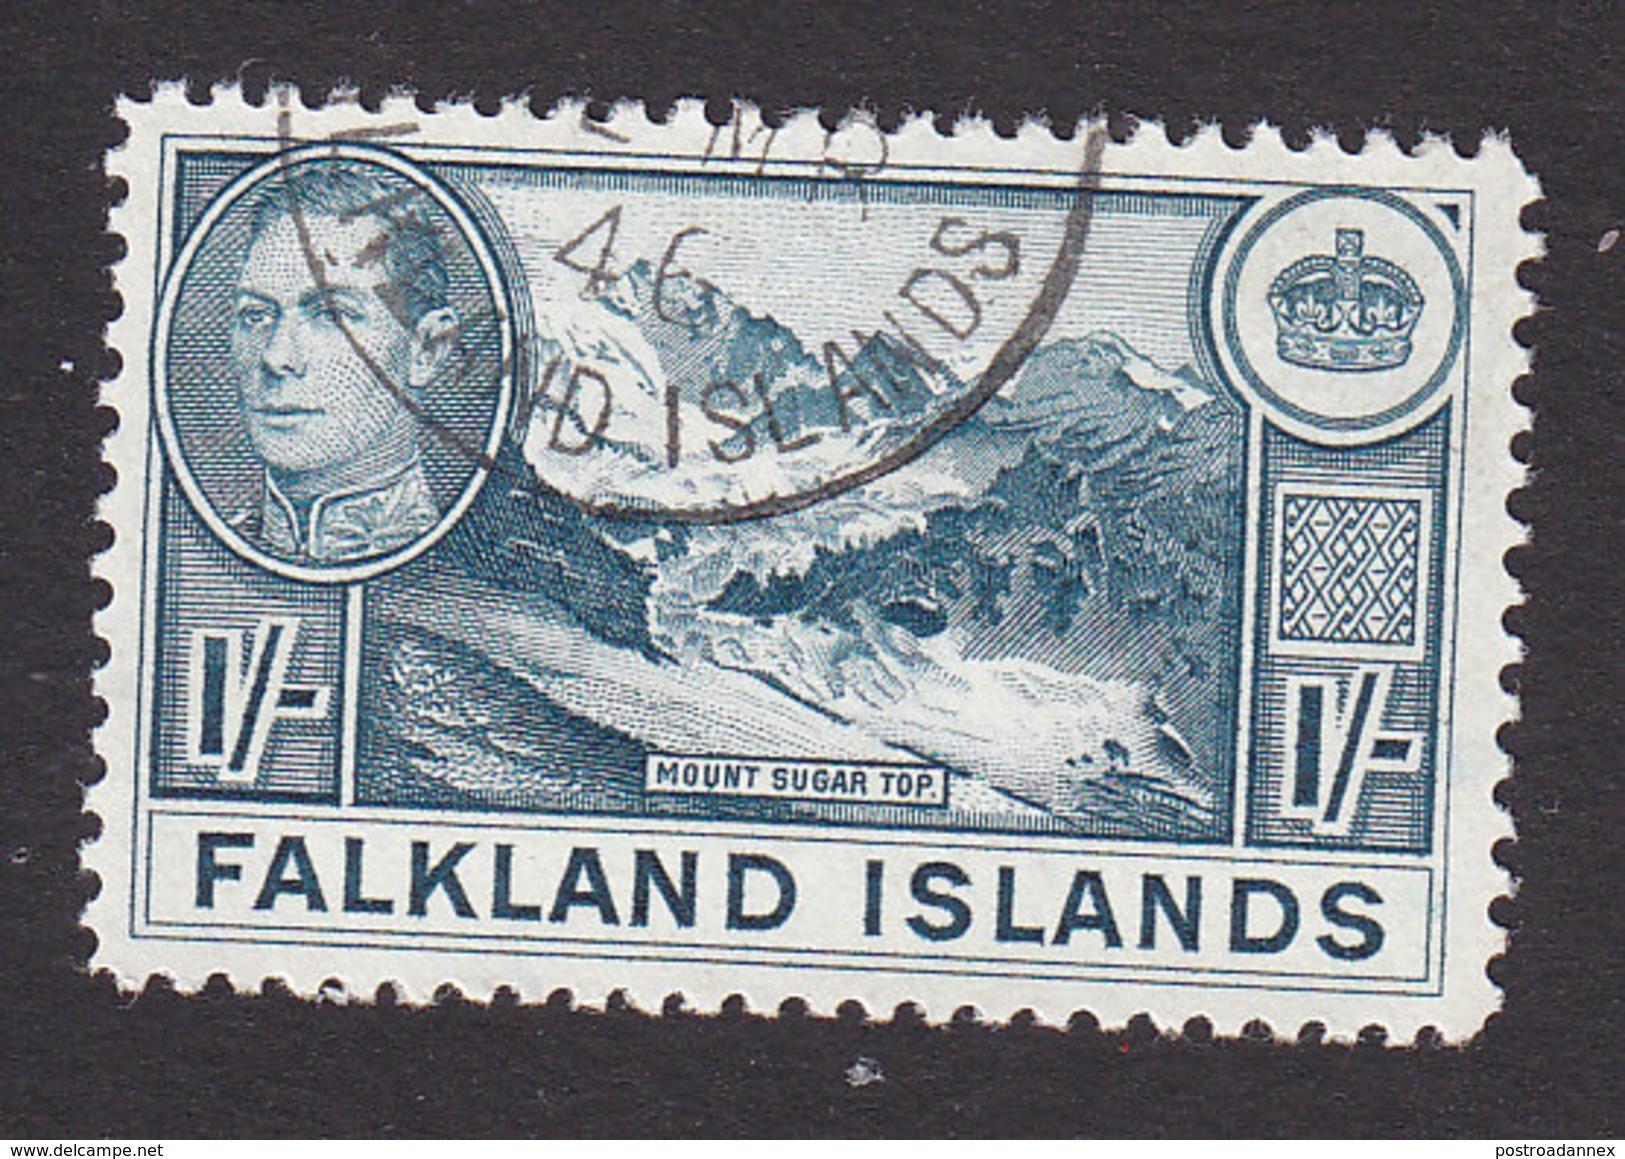 Falkland Islands, Scott #91, Used, George VI And Scenes Of Falkland Islands, Issued 1938 - Falkland Islands